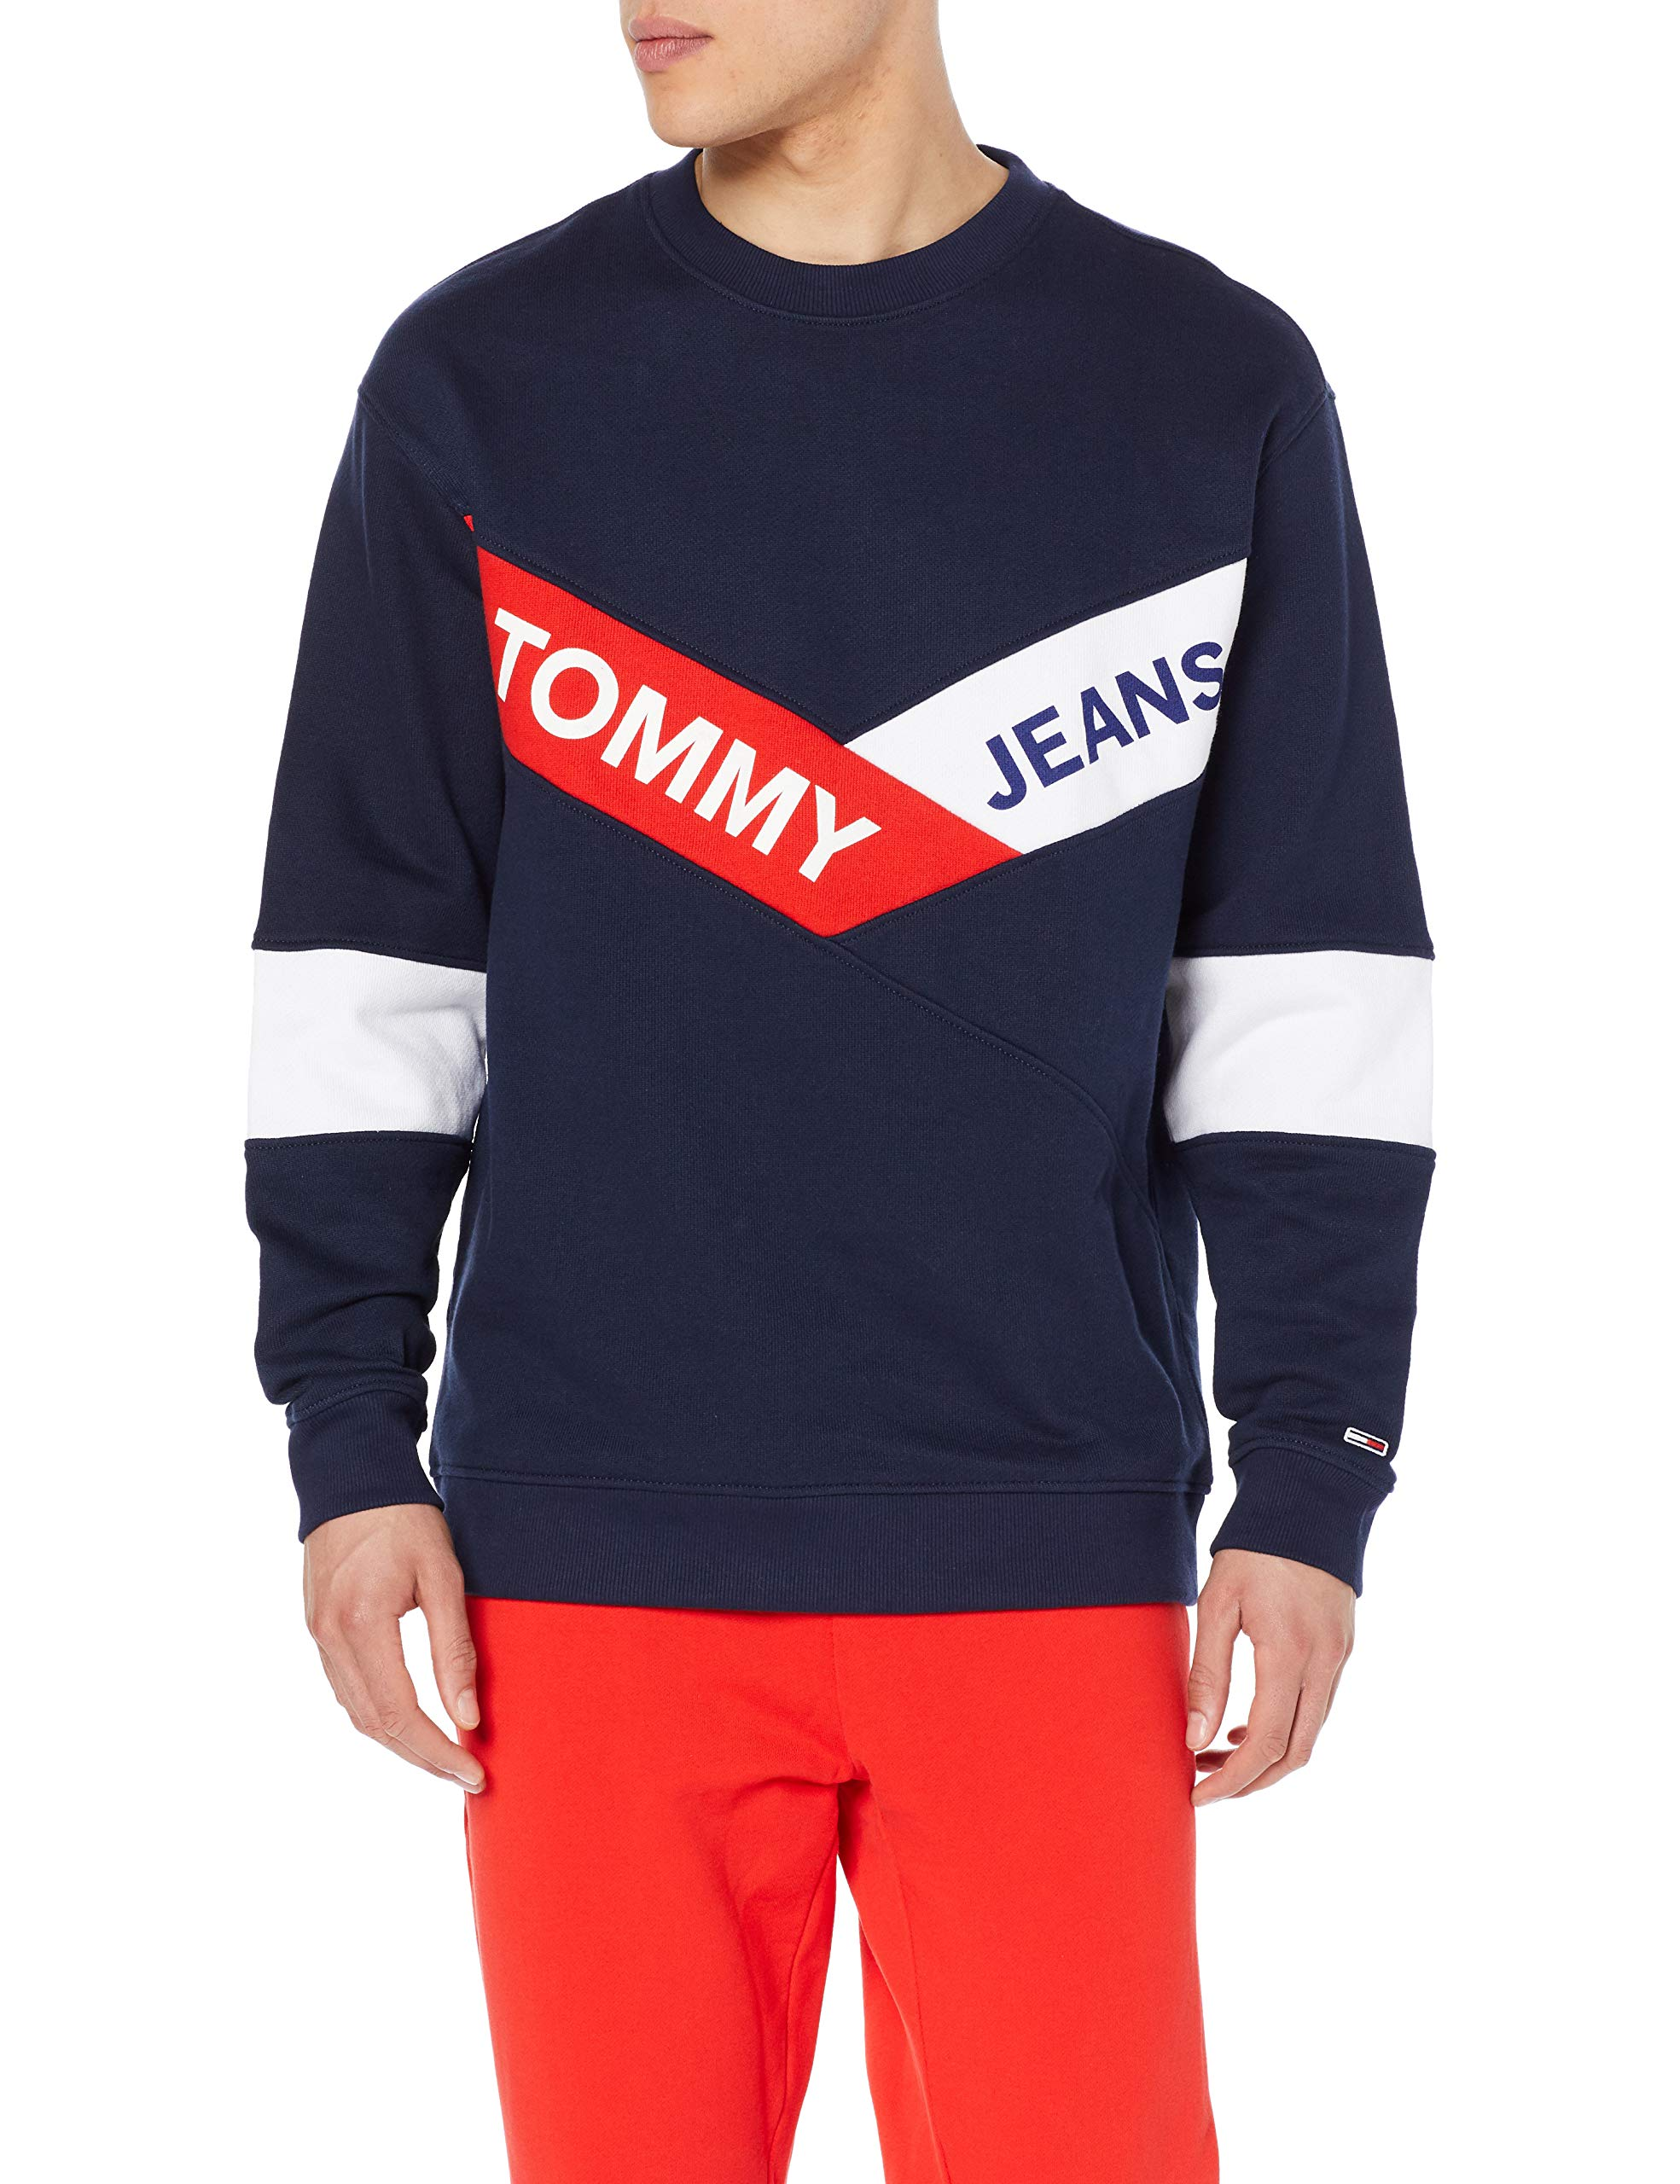 Tjm Tommy Iris 002L Crew Homme Sweat shirtBleublack Jeans Chevron 0ZnkXNw8OP